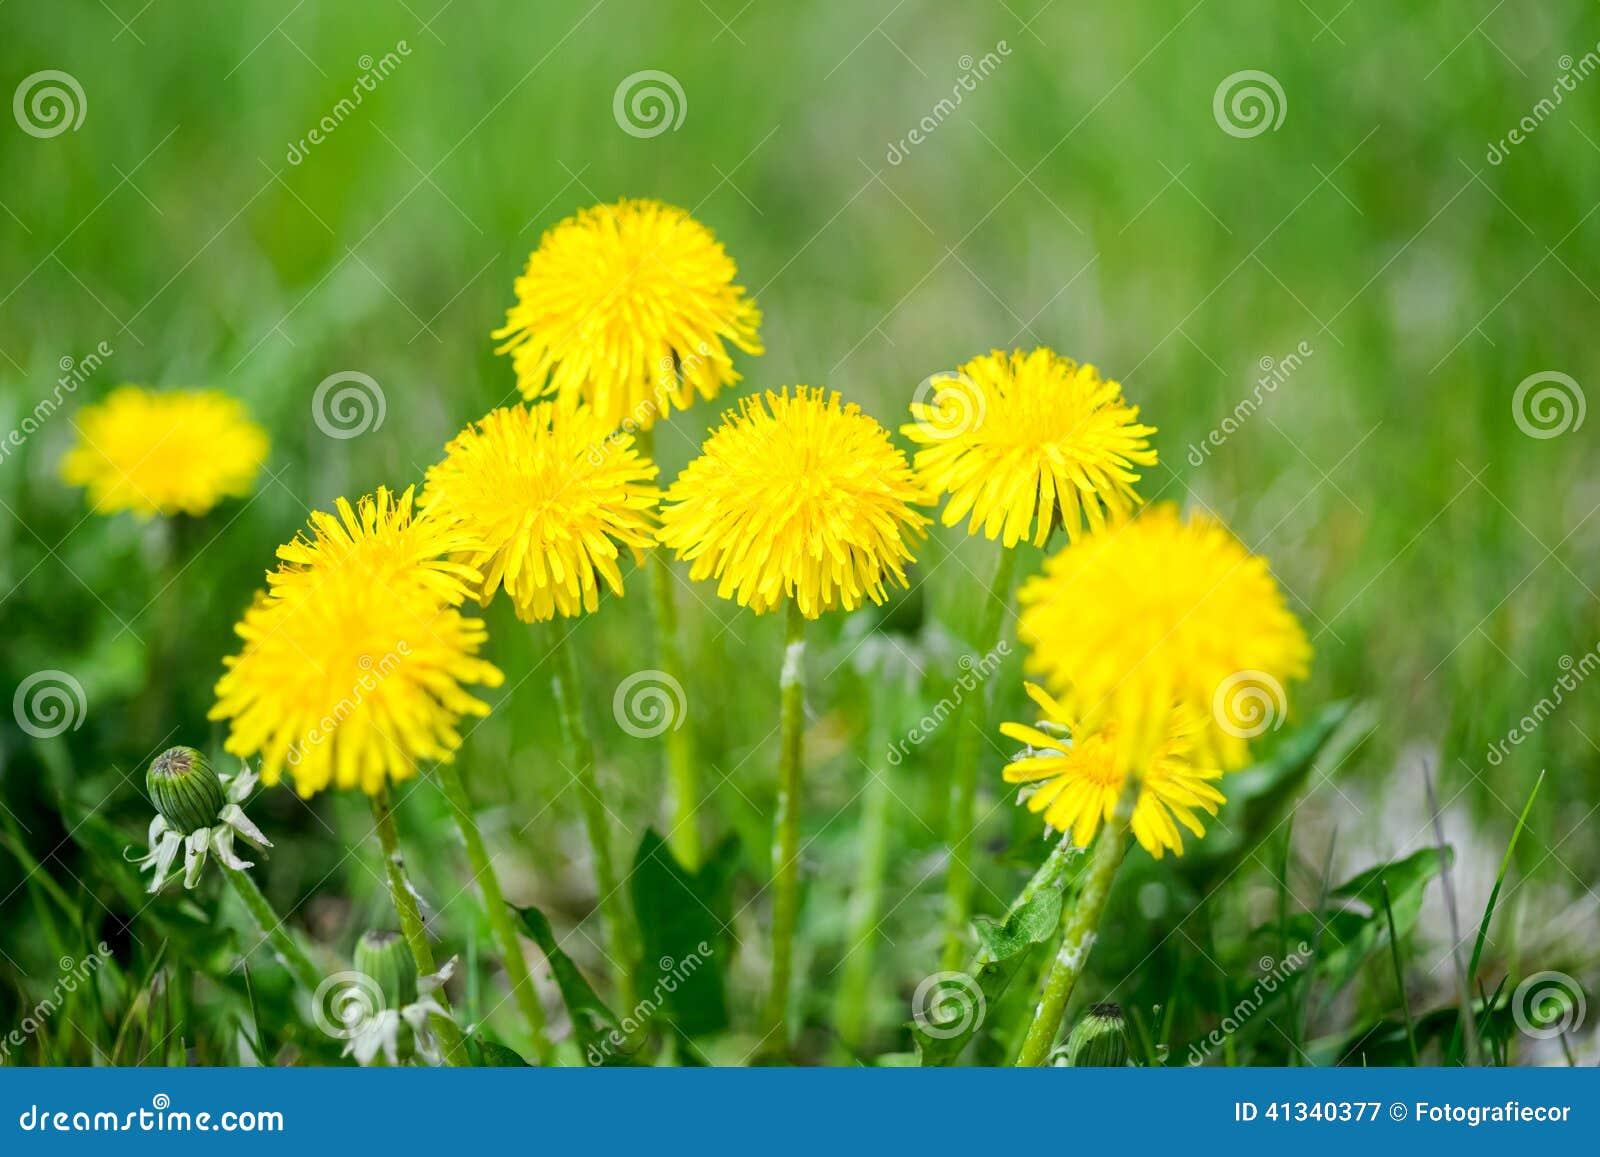 Art Beautiful spring flowers background